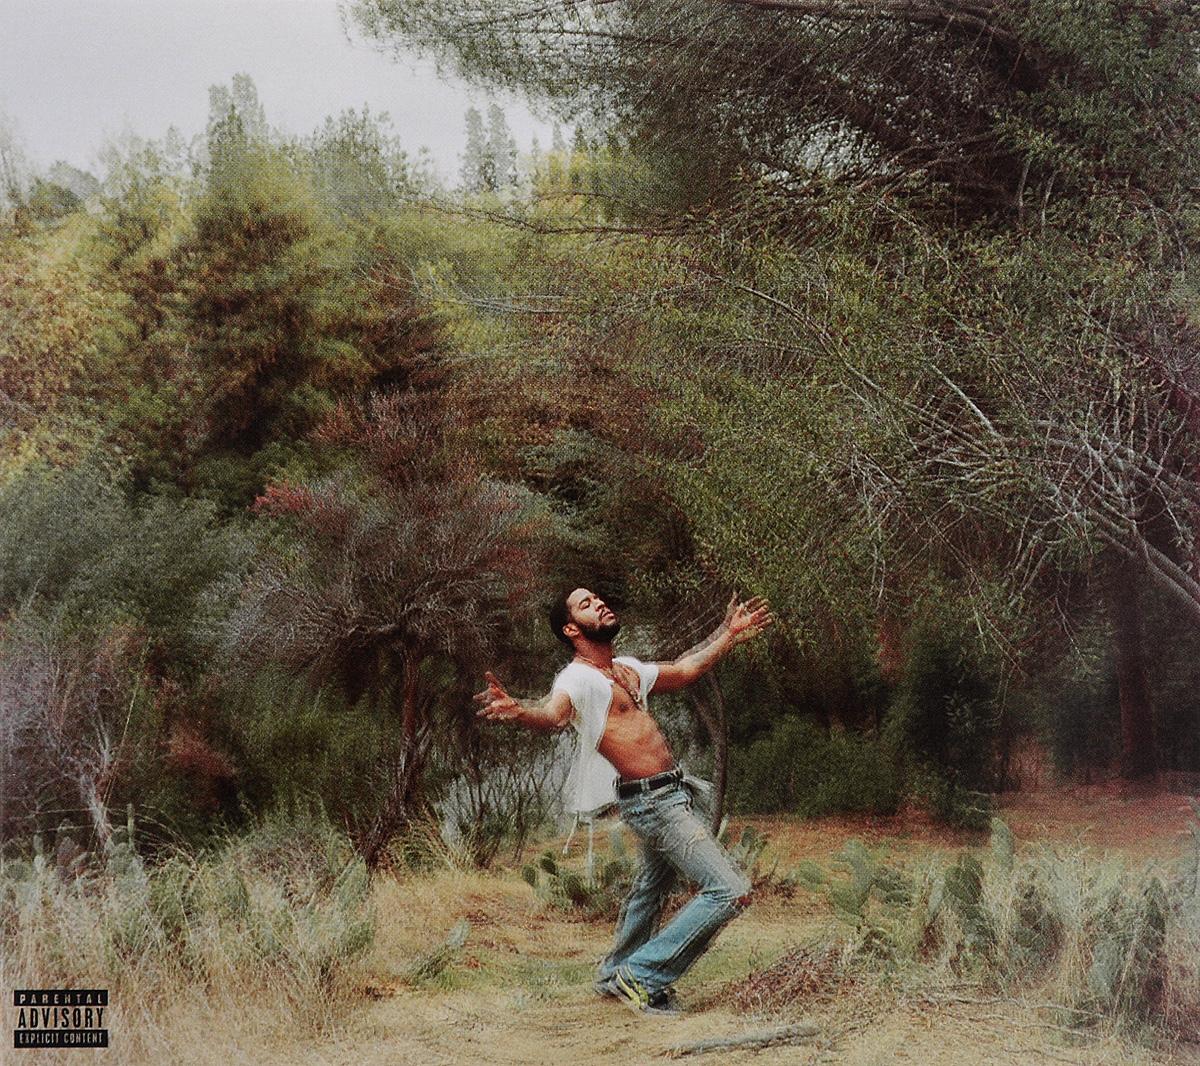 Kid Cudi Kid Cudi. Speedin' Bullet 2 Heaven (2 CD) bullet height bullet height no atonement lp cd